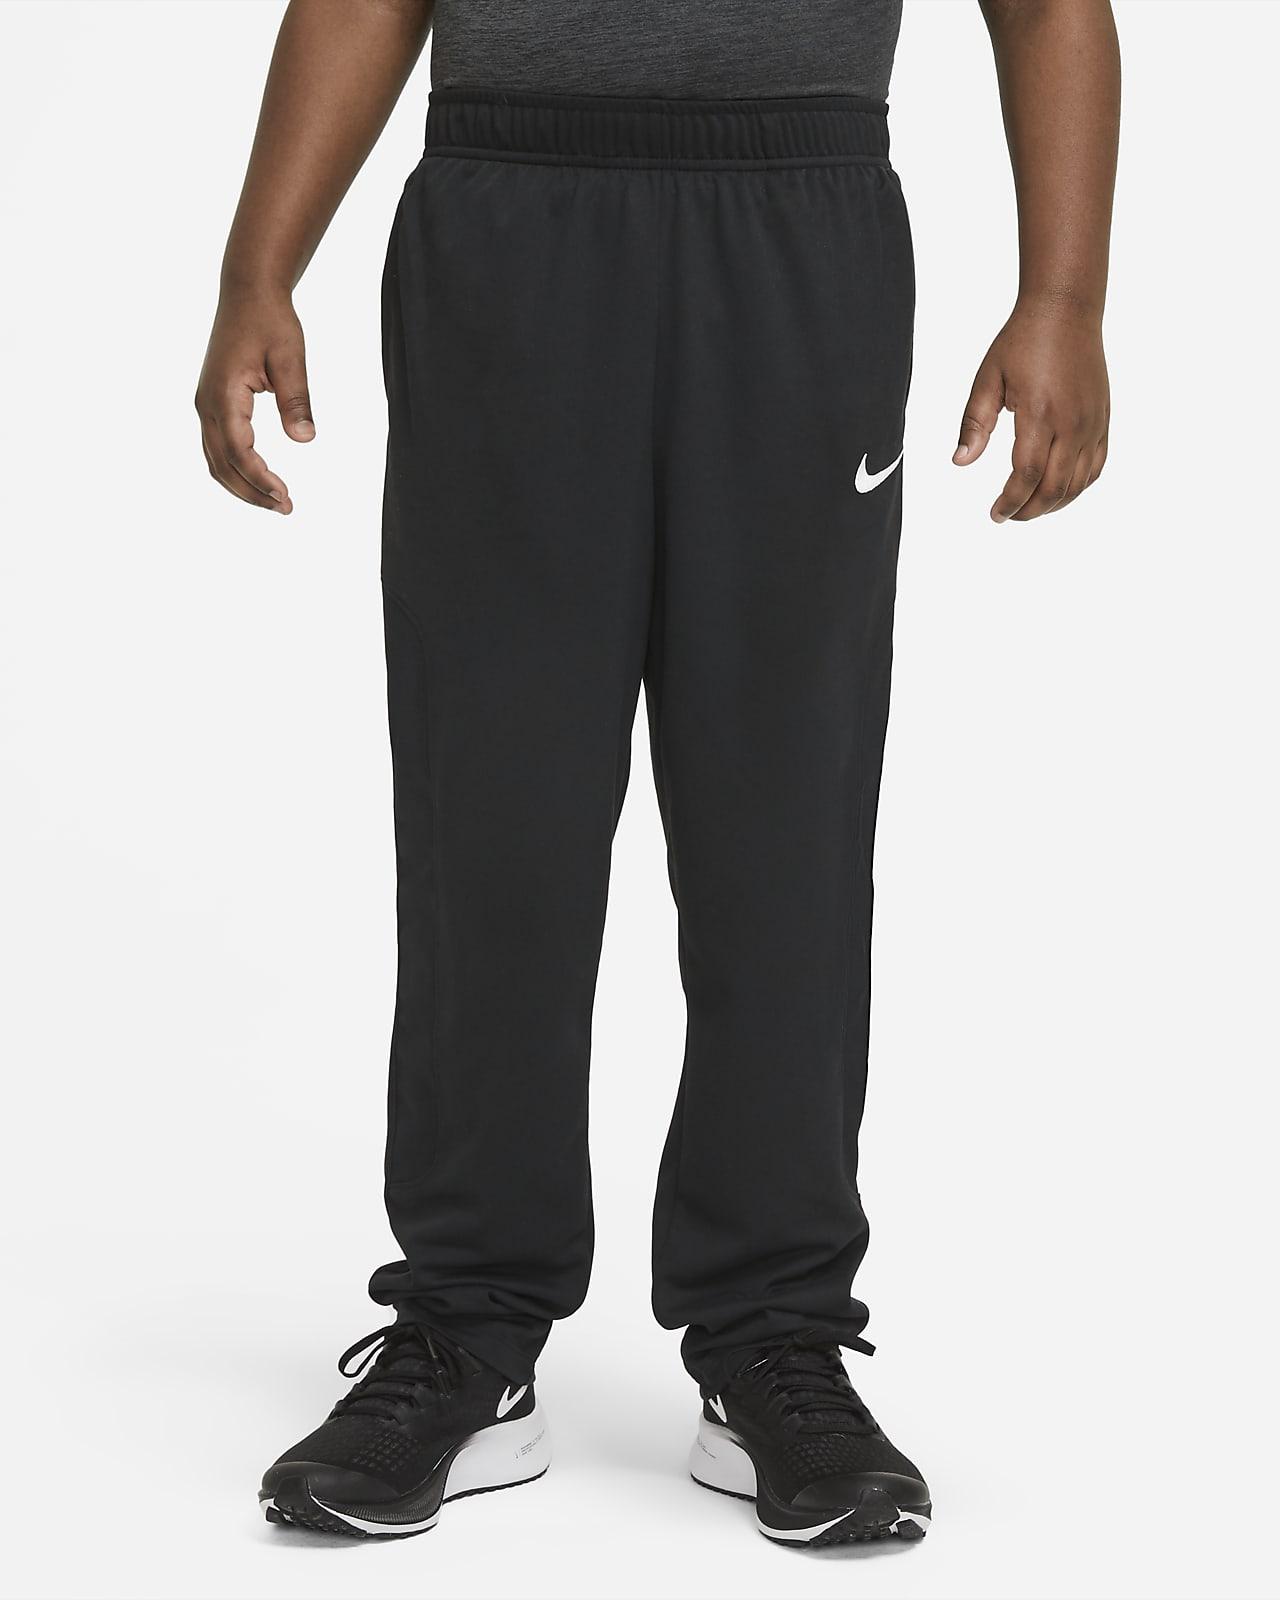 Pantalones De Entrenamiento Para Ninos Talla Grande Nike Sport Talla Extendida Nike Com